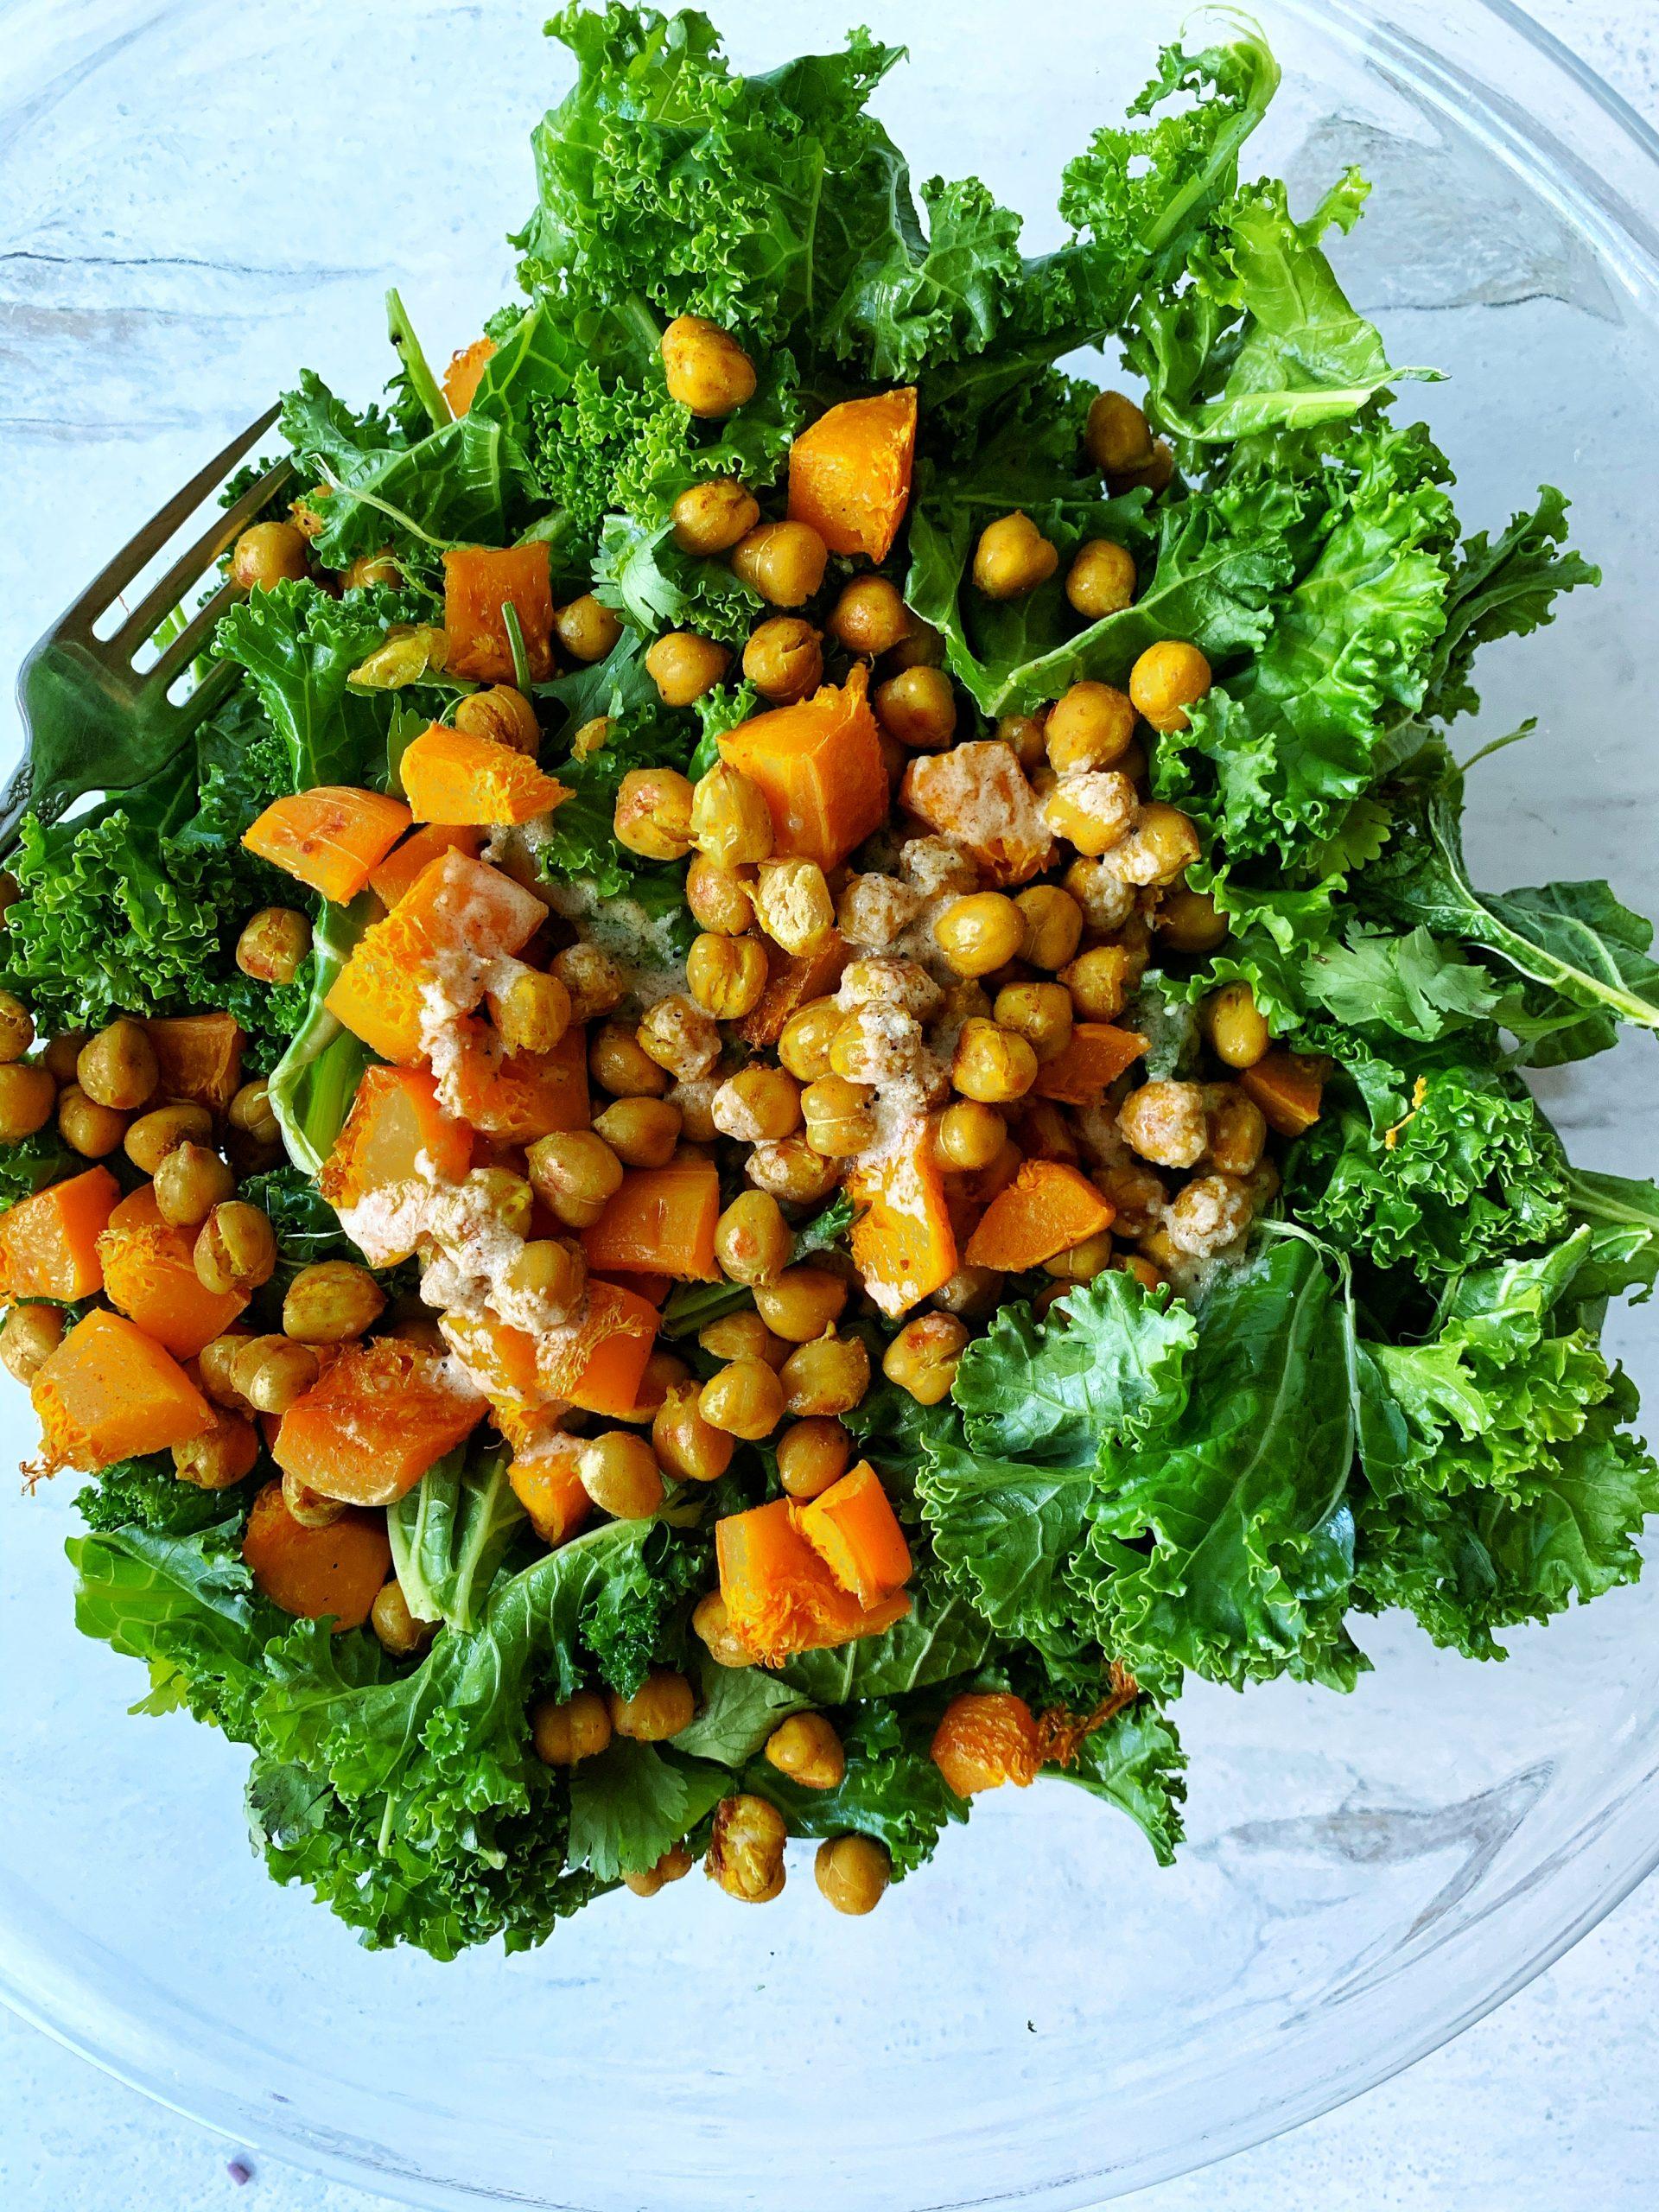 Kale Chickpea Salad with Tahini Dressing